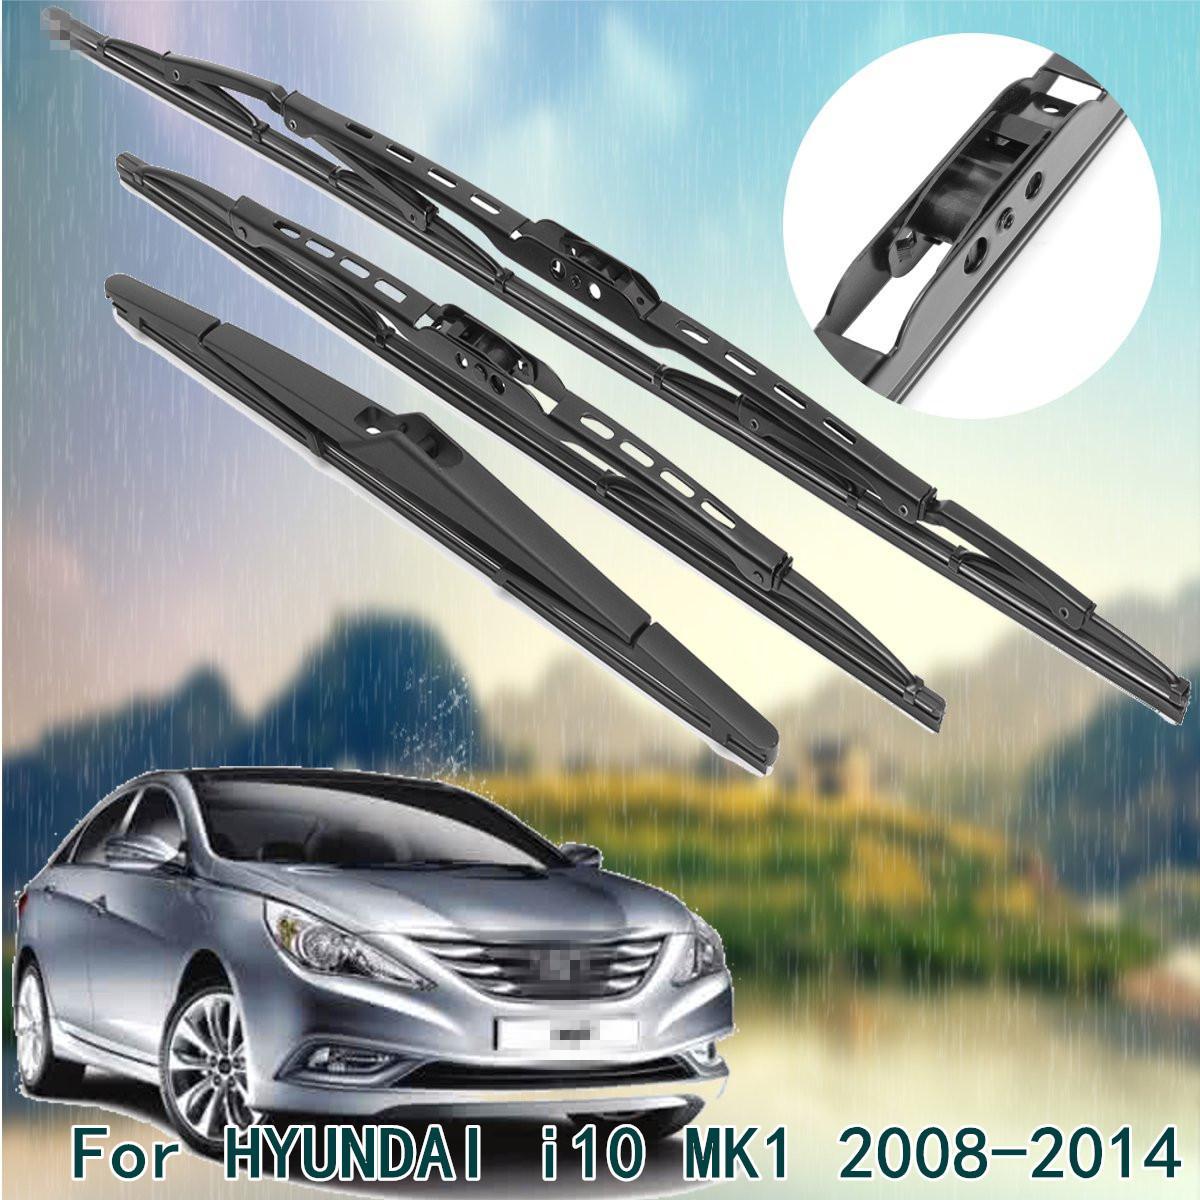 For Hyundai I10 Mk1 08 14 Front Rear Windscreen Wiper Blades X3 Complete Set Black Buy Sell Online Best Prices In Srilanka Daraz Lk